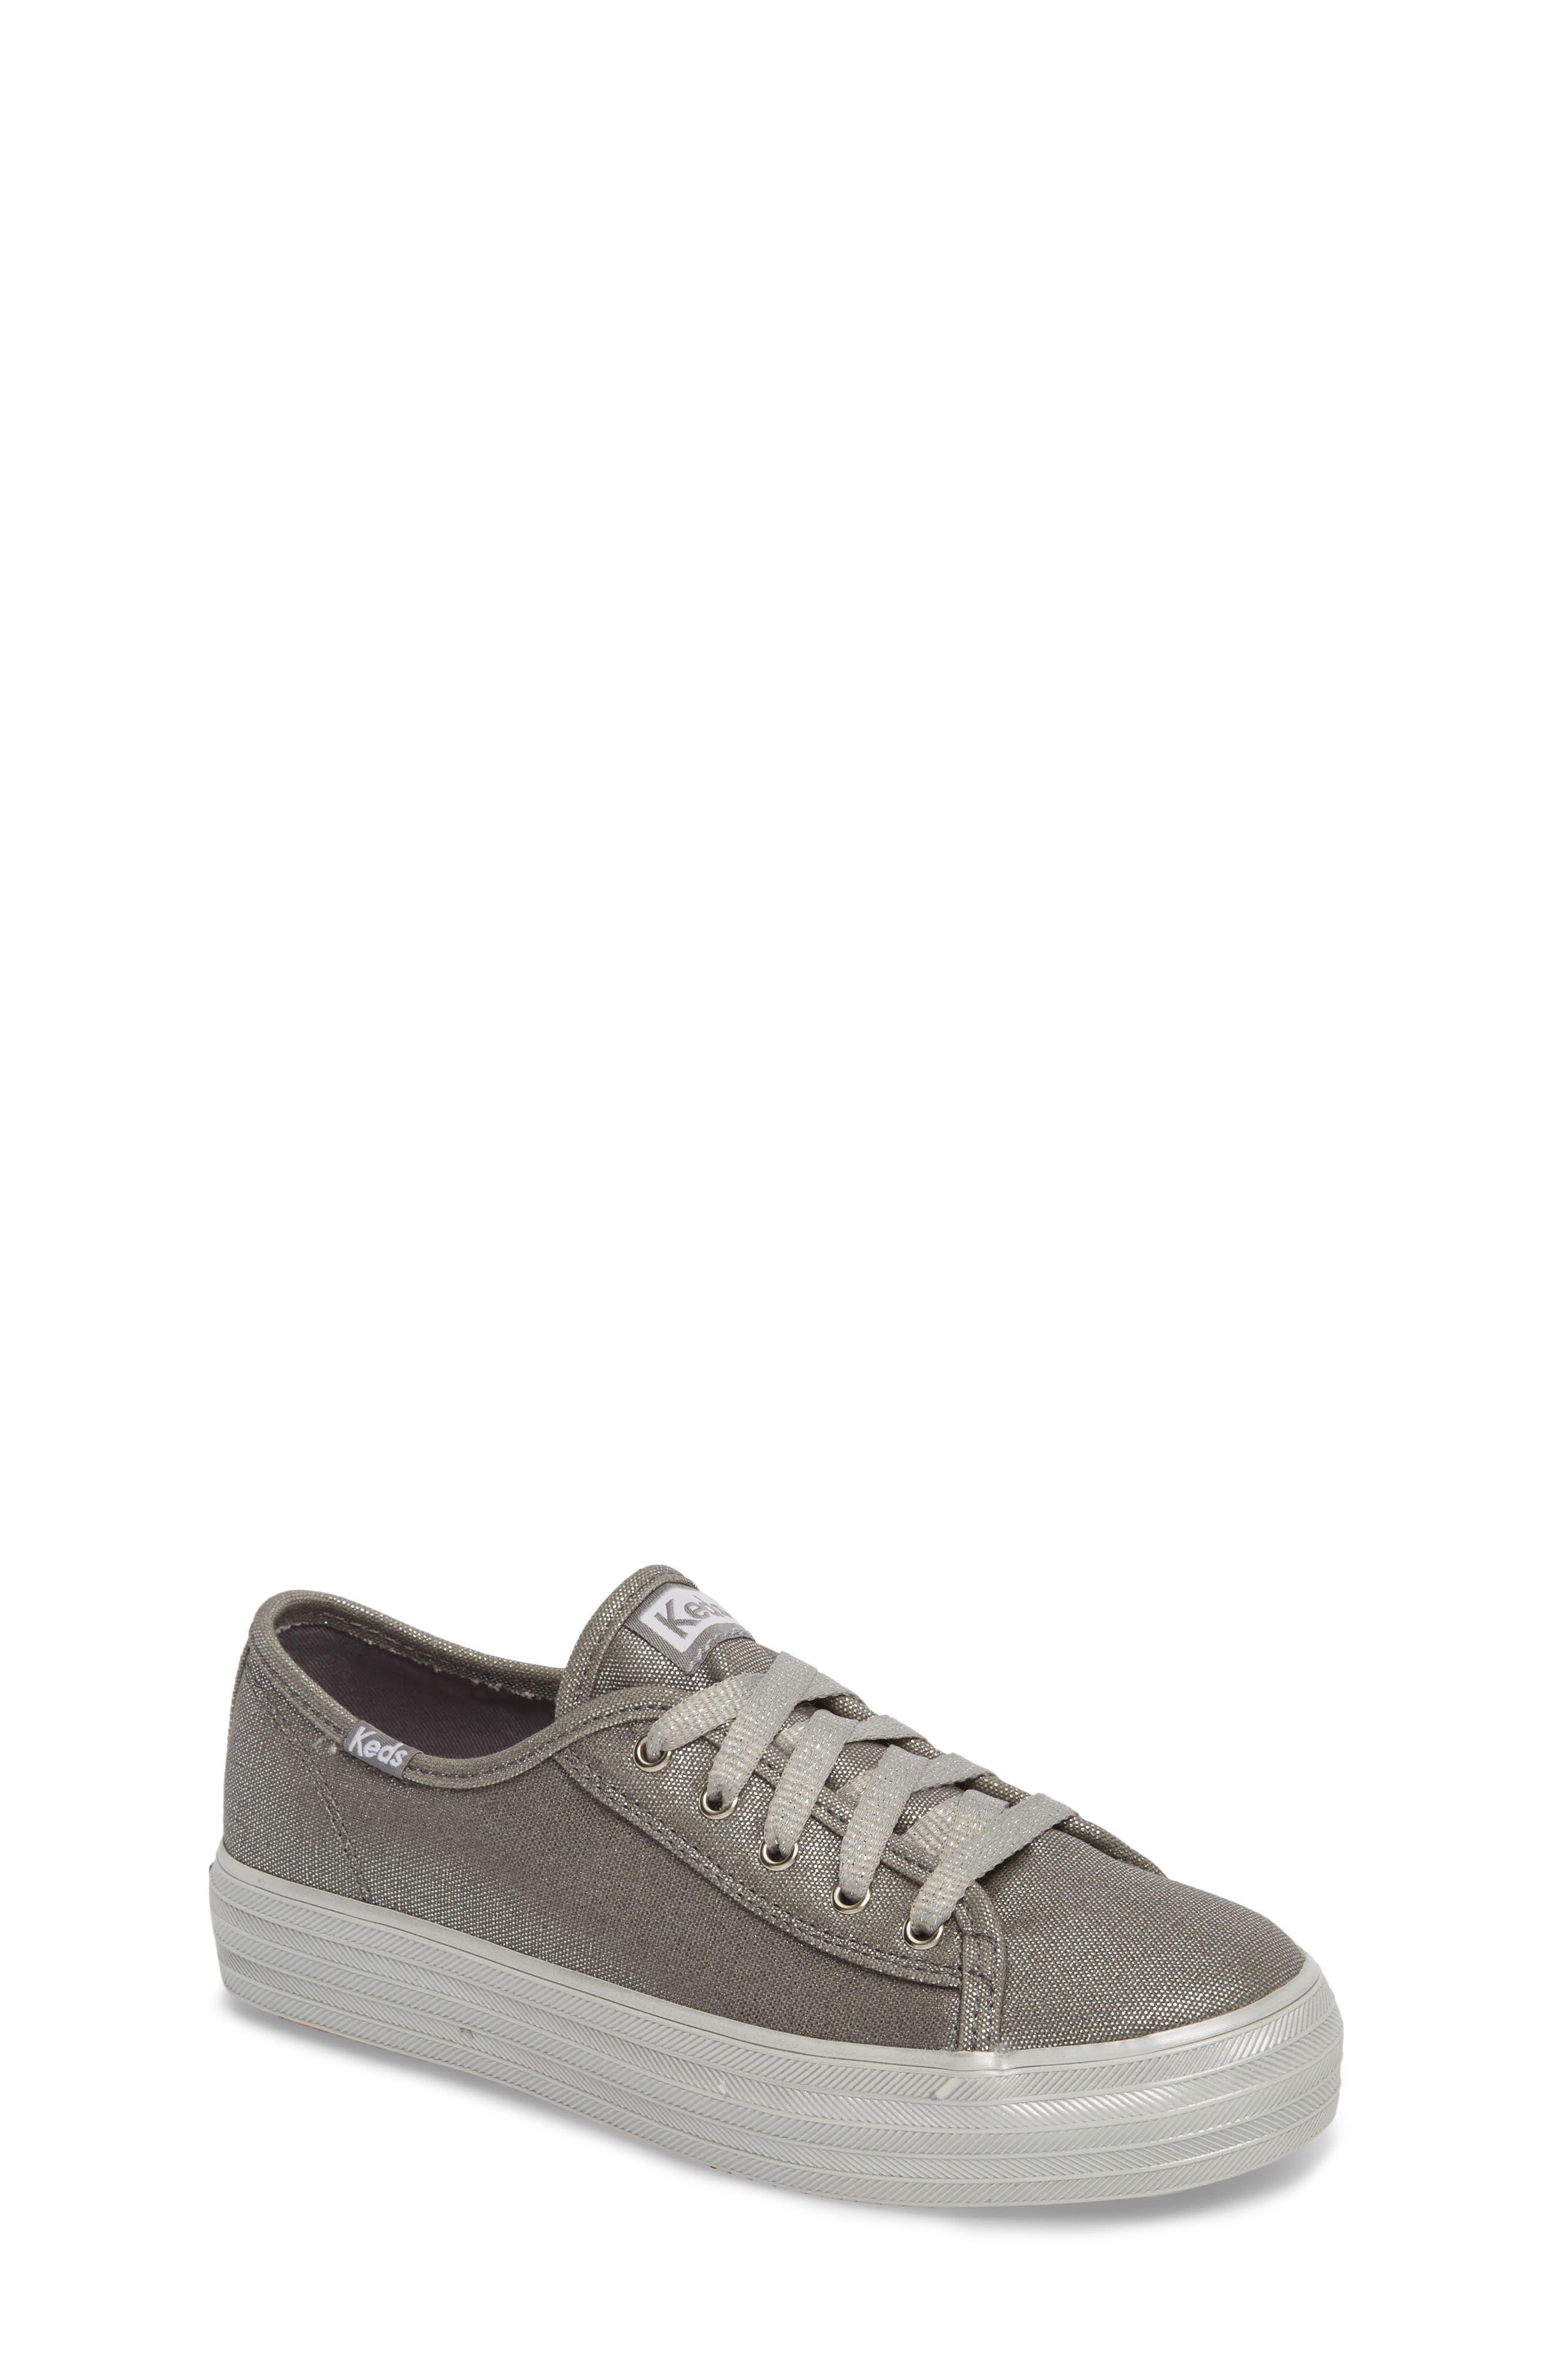 Triple Kick Platform Sneaker,                         Main,                         color, Silver/ Silver